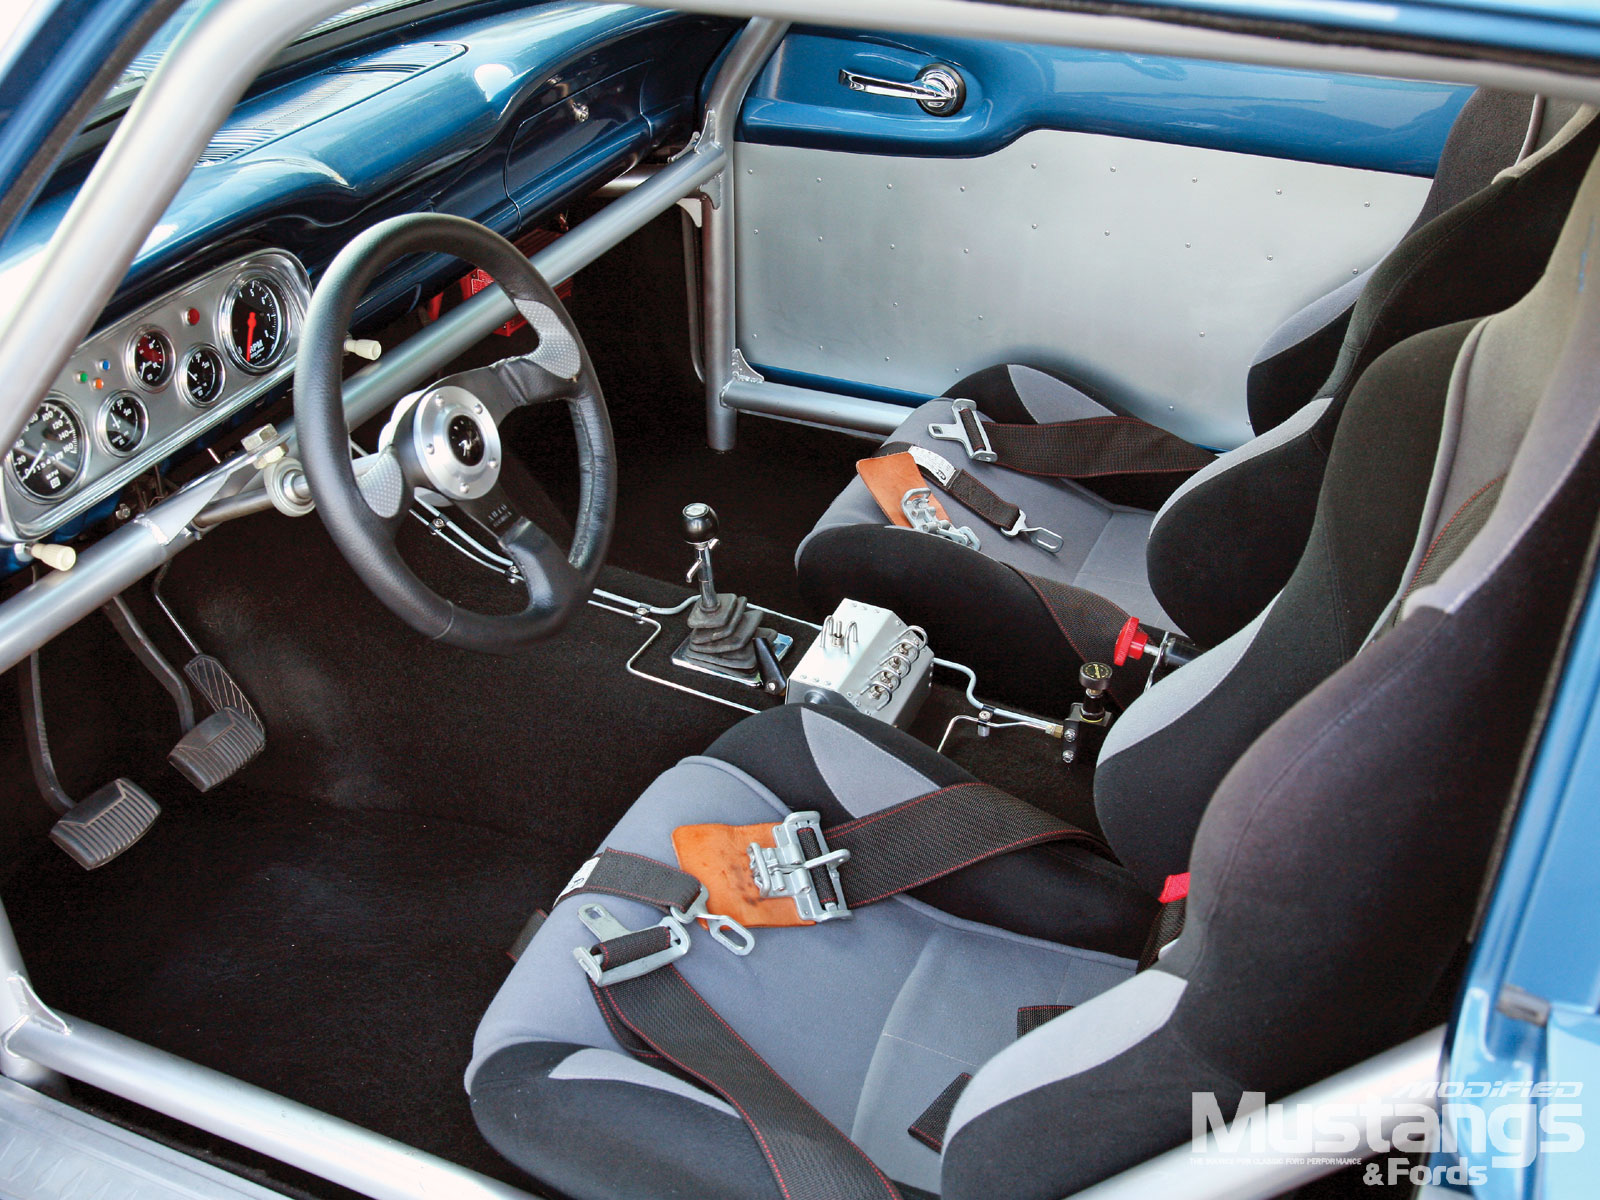 Mdmp 1103 06 O 1960 Ford Falcon Two Door Sedan Interior Photo 30497936 1960 Ford Falcon Two Door Sedan Racetrack Raptor